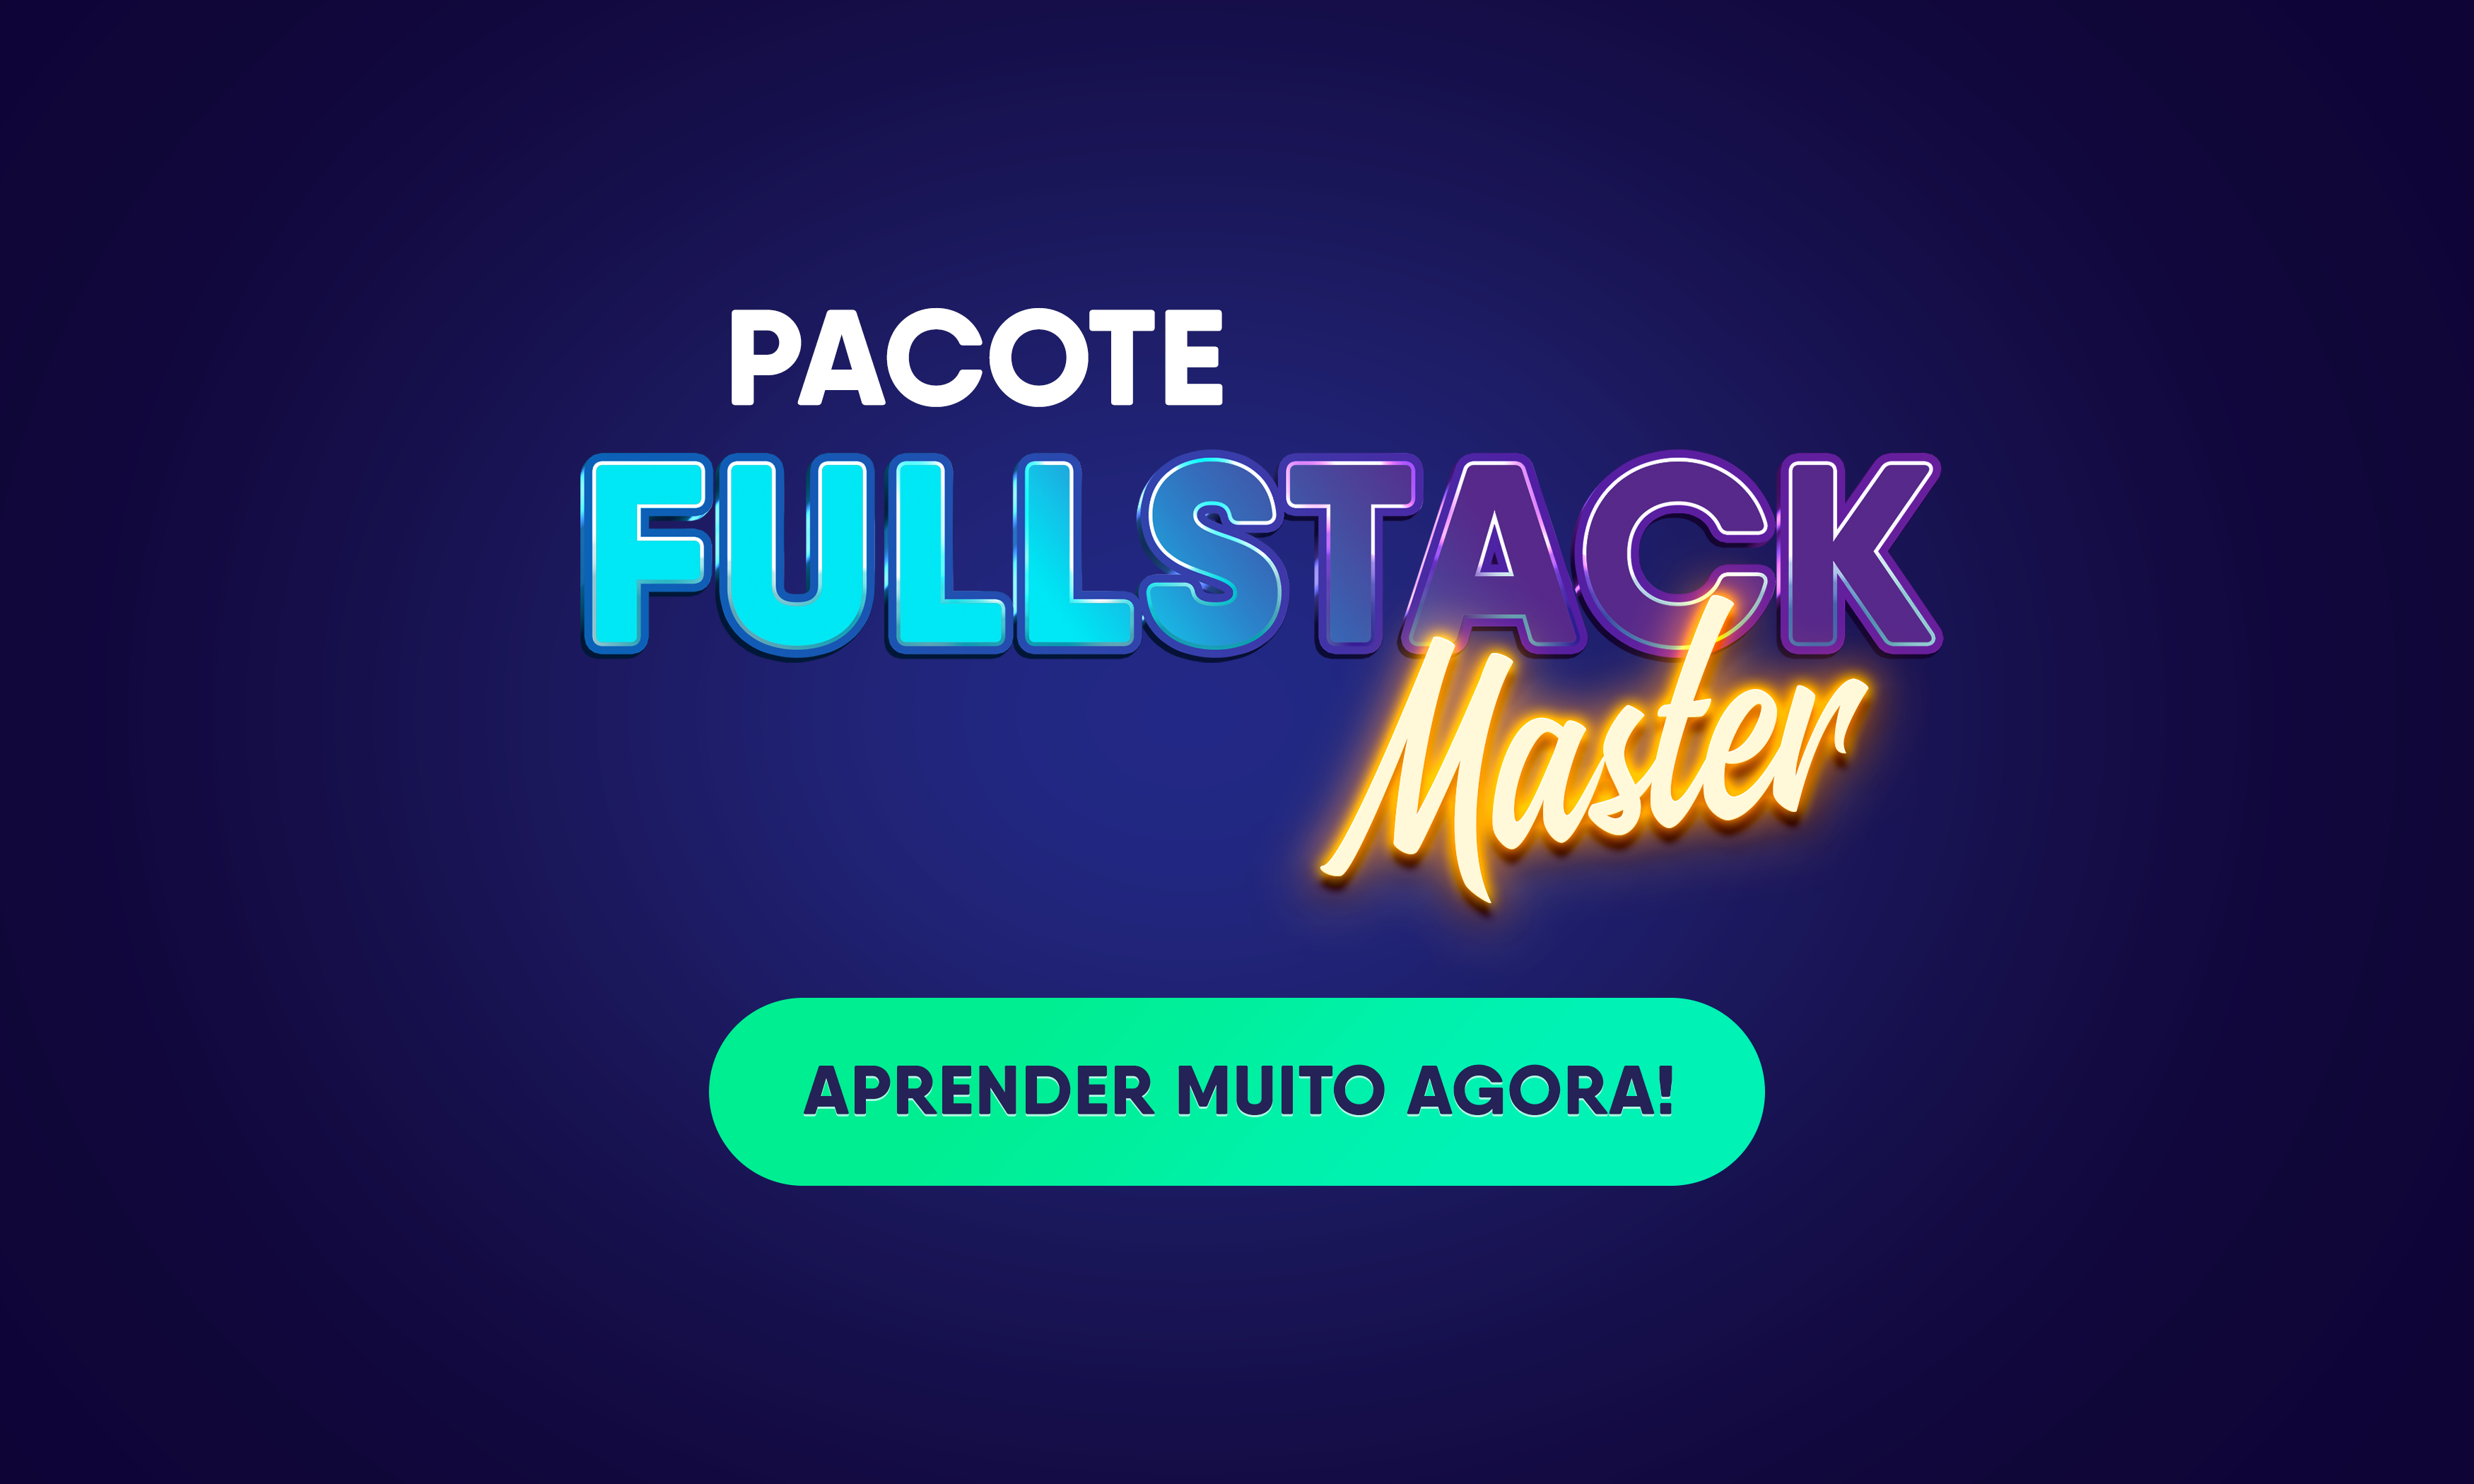 curso-fullstack-master-com-certificado-canalti